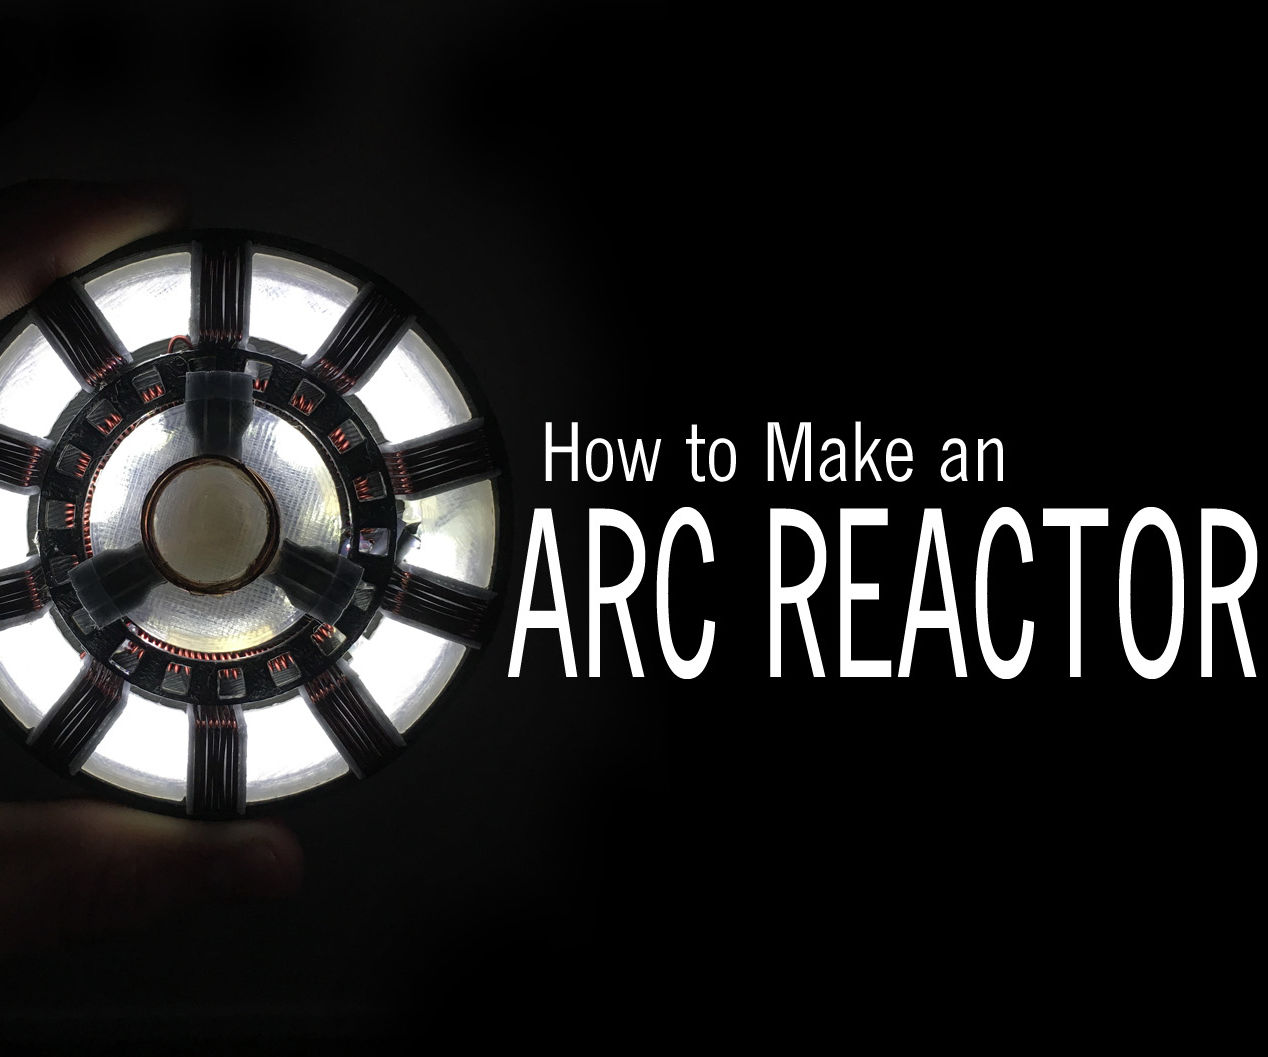 Wearable Iron Man Arc Reactor